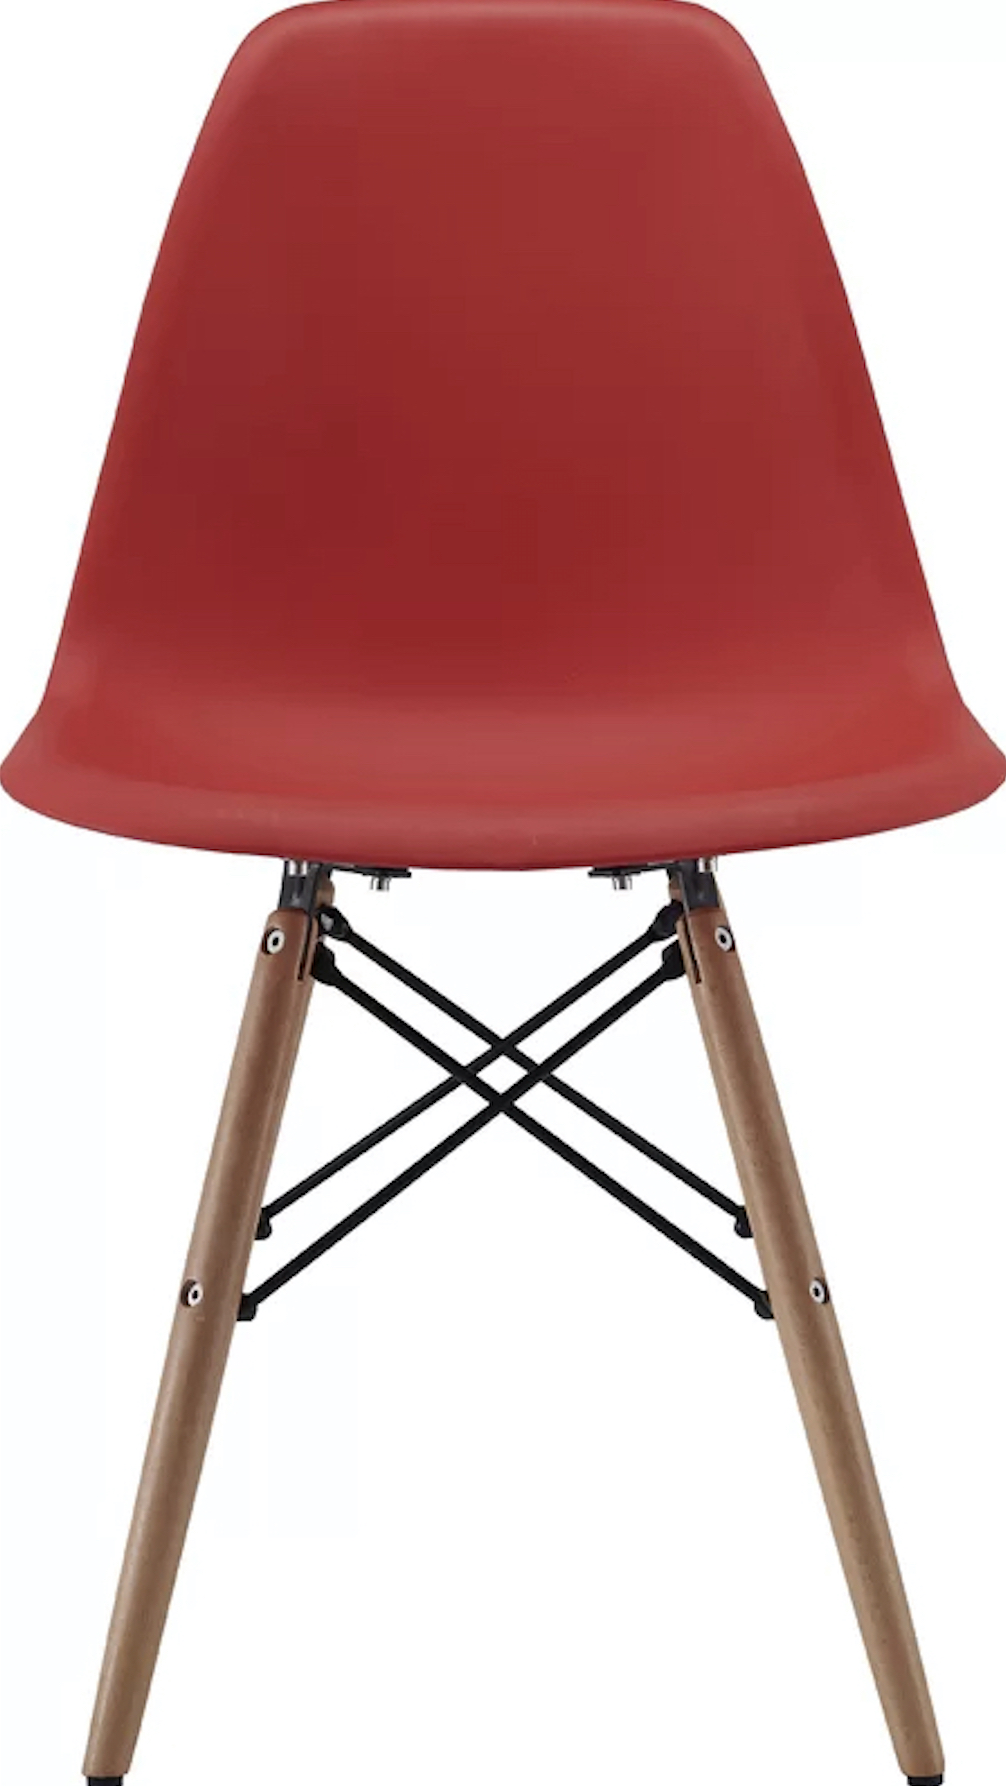 vandorn-red-chair-dining